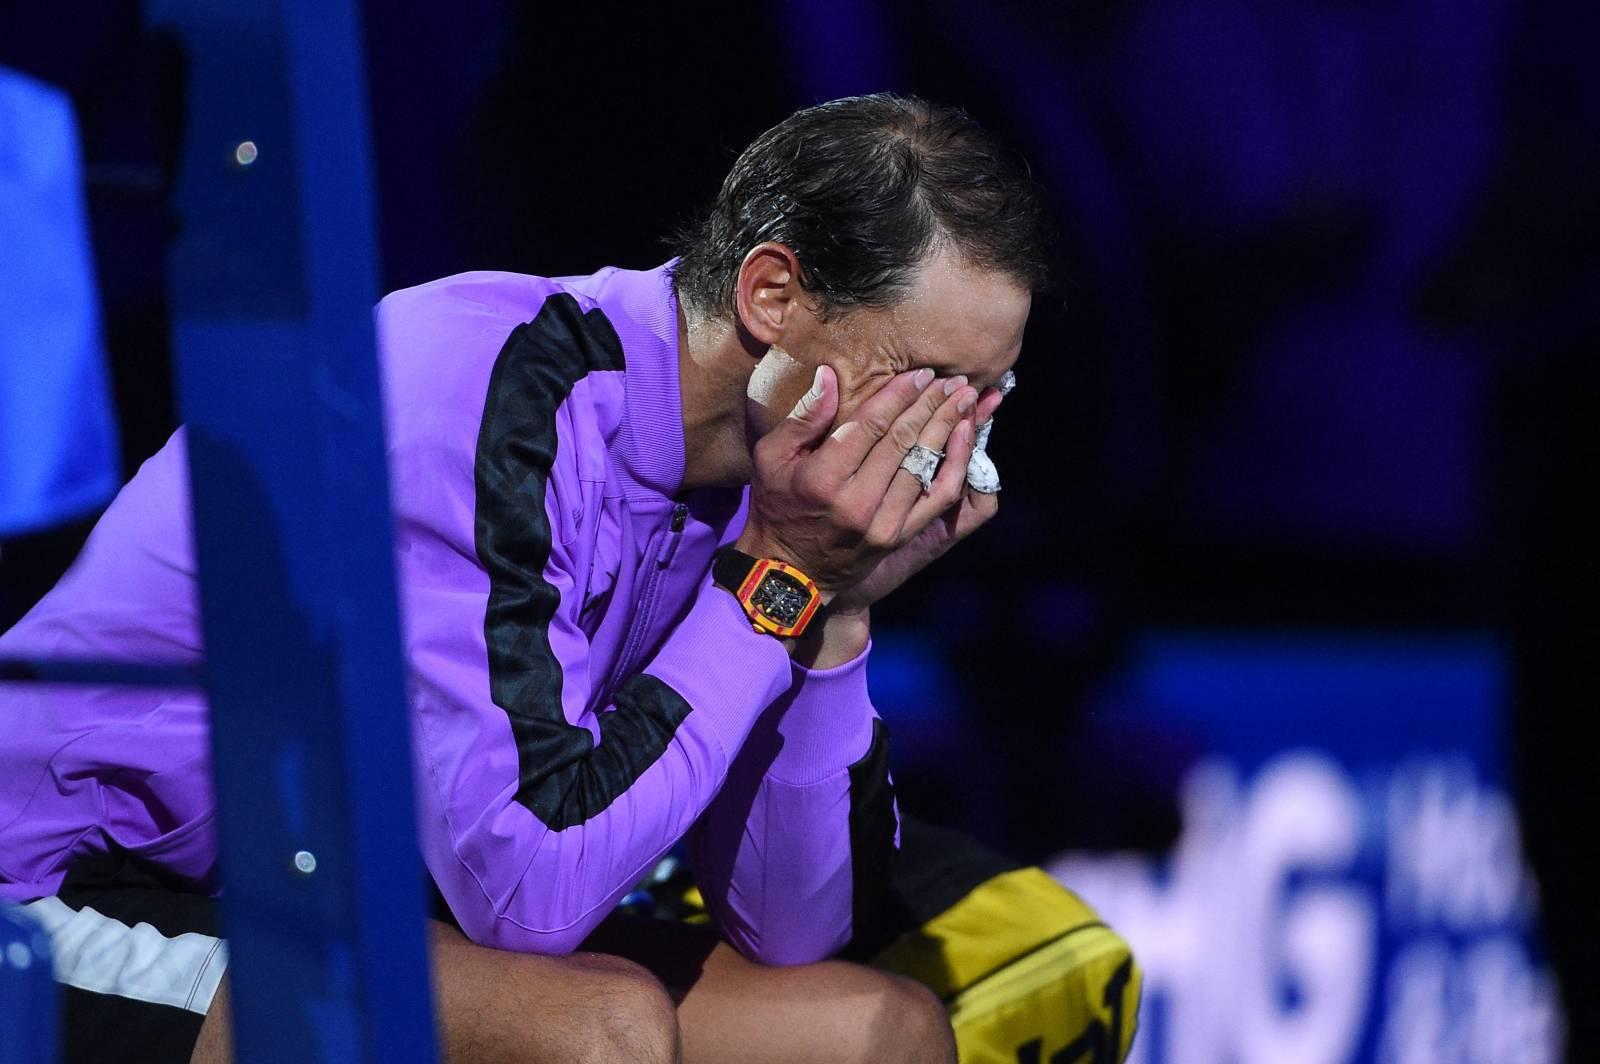 US Open - Rafael Nadal Wins 4th Title